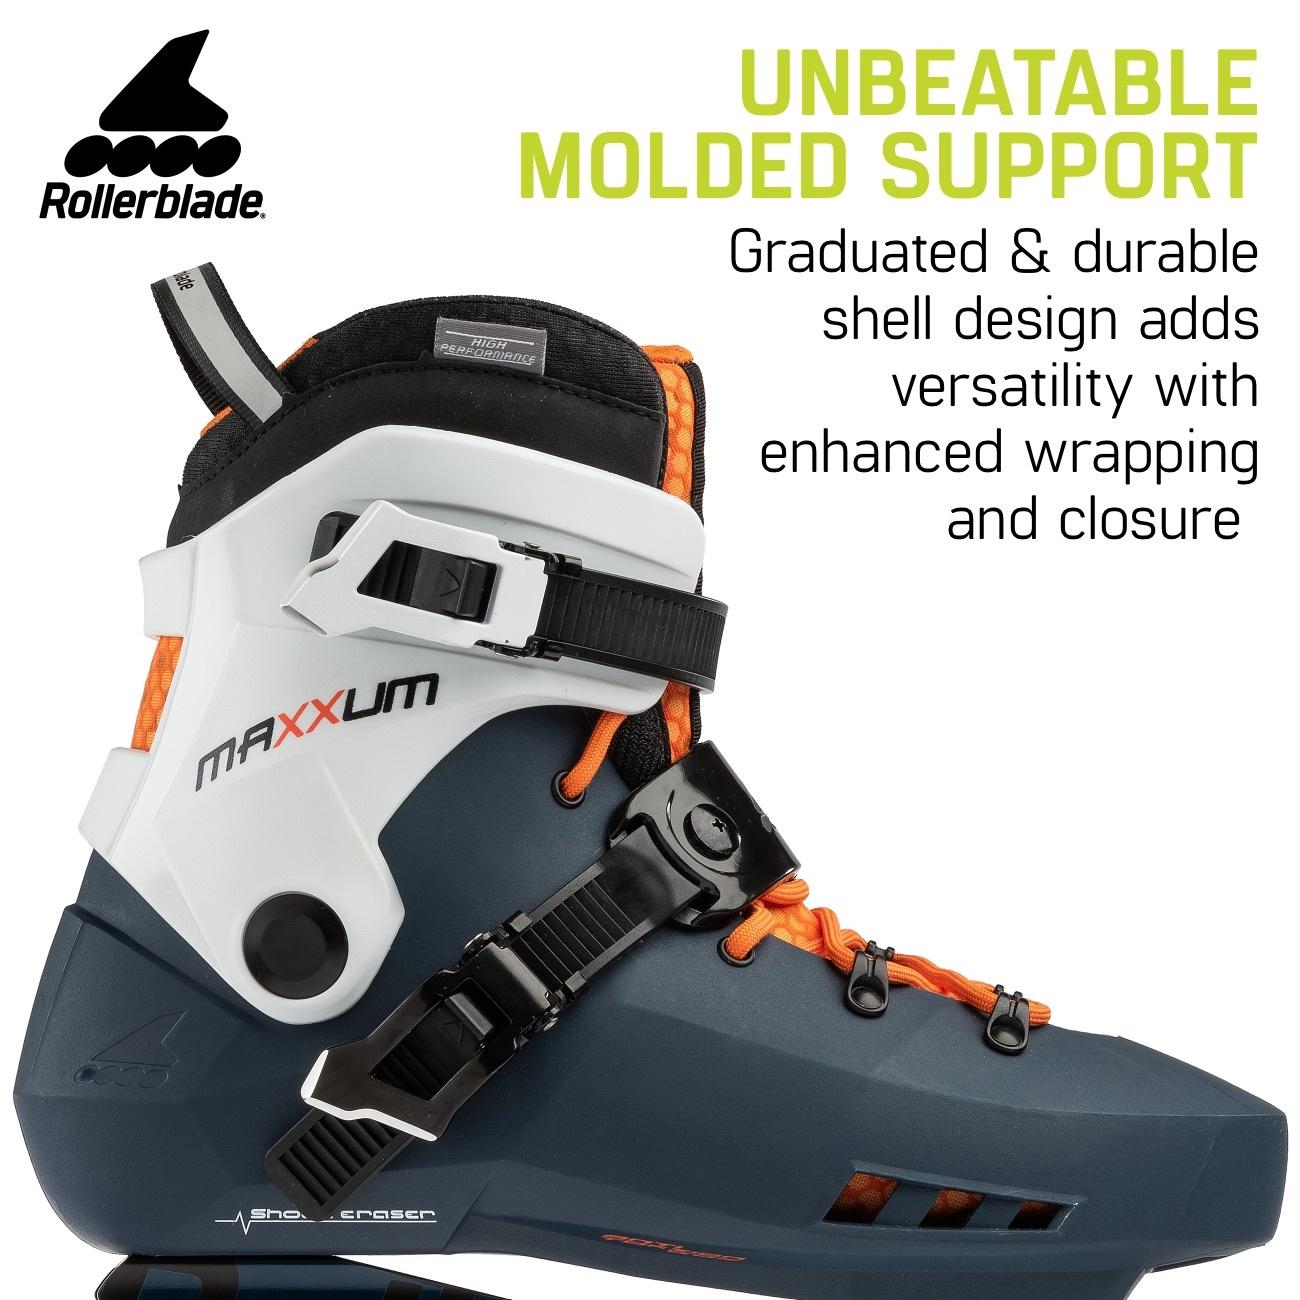 Rollerblade Rollerblade Maxxum Edge 125 3WD